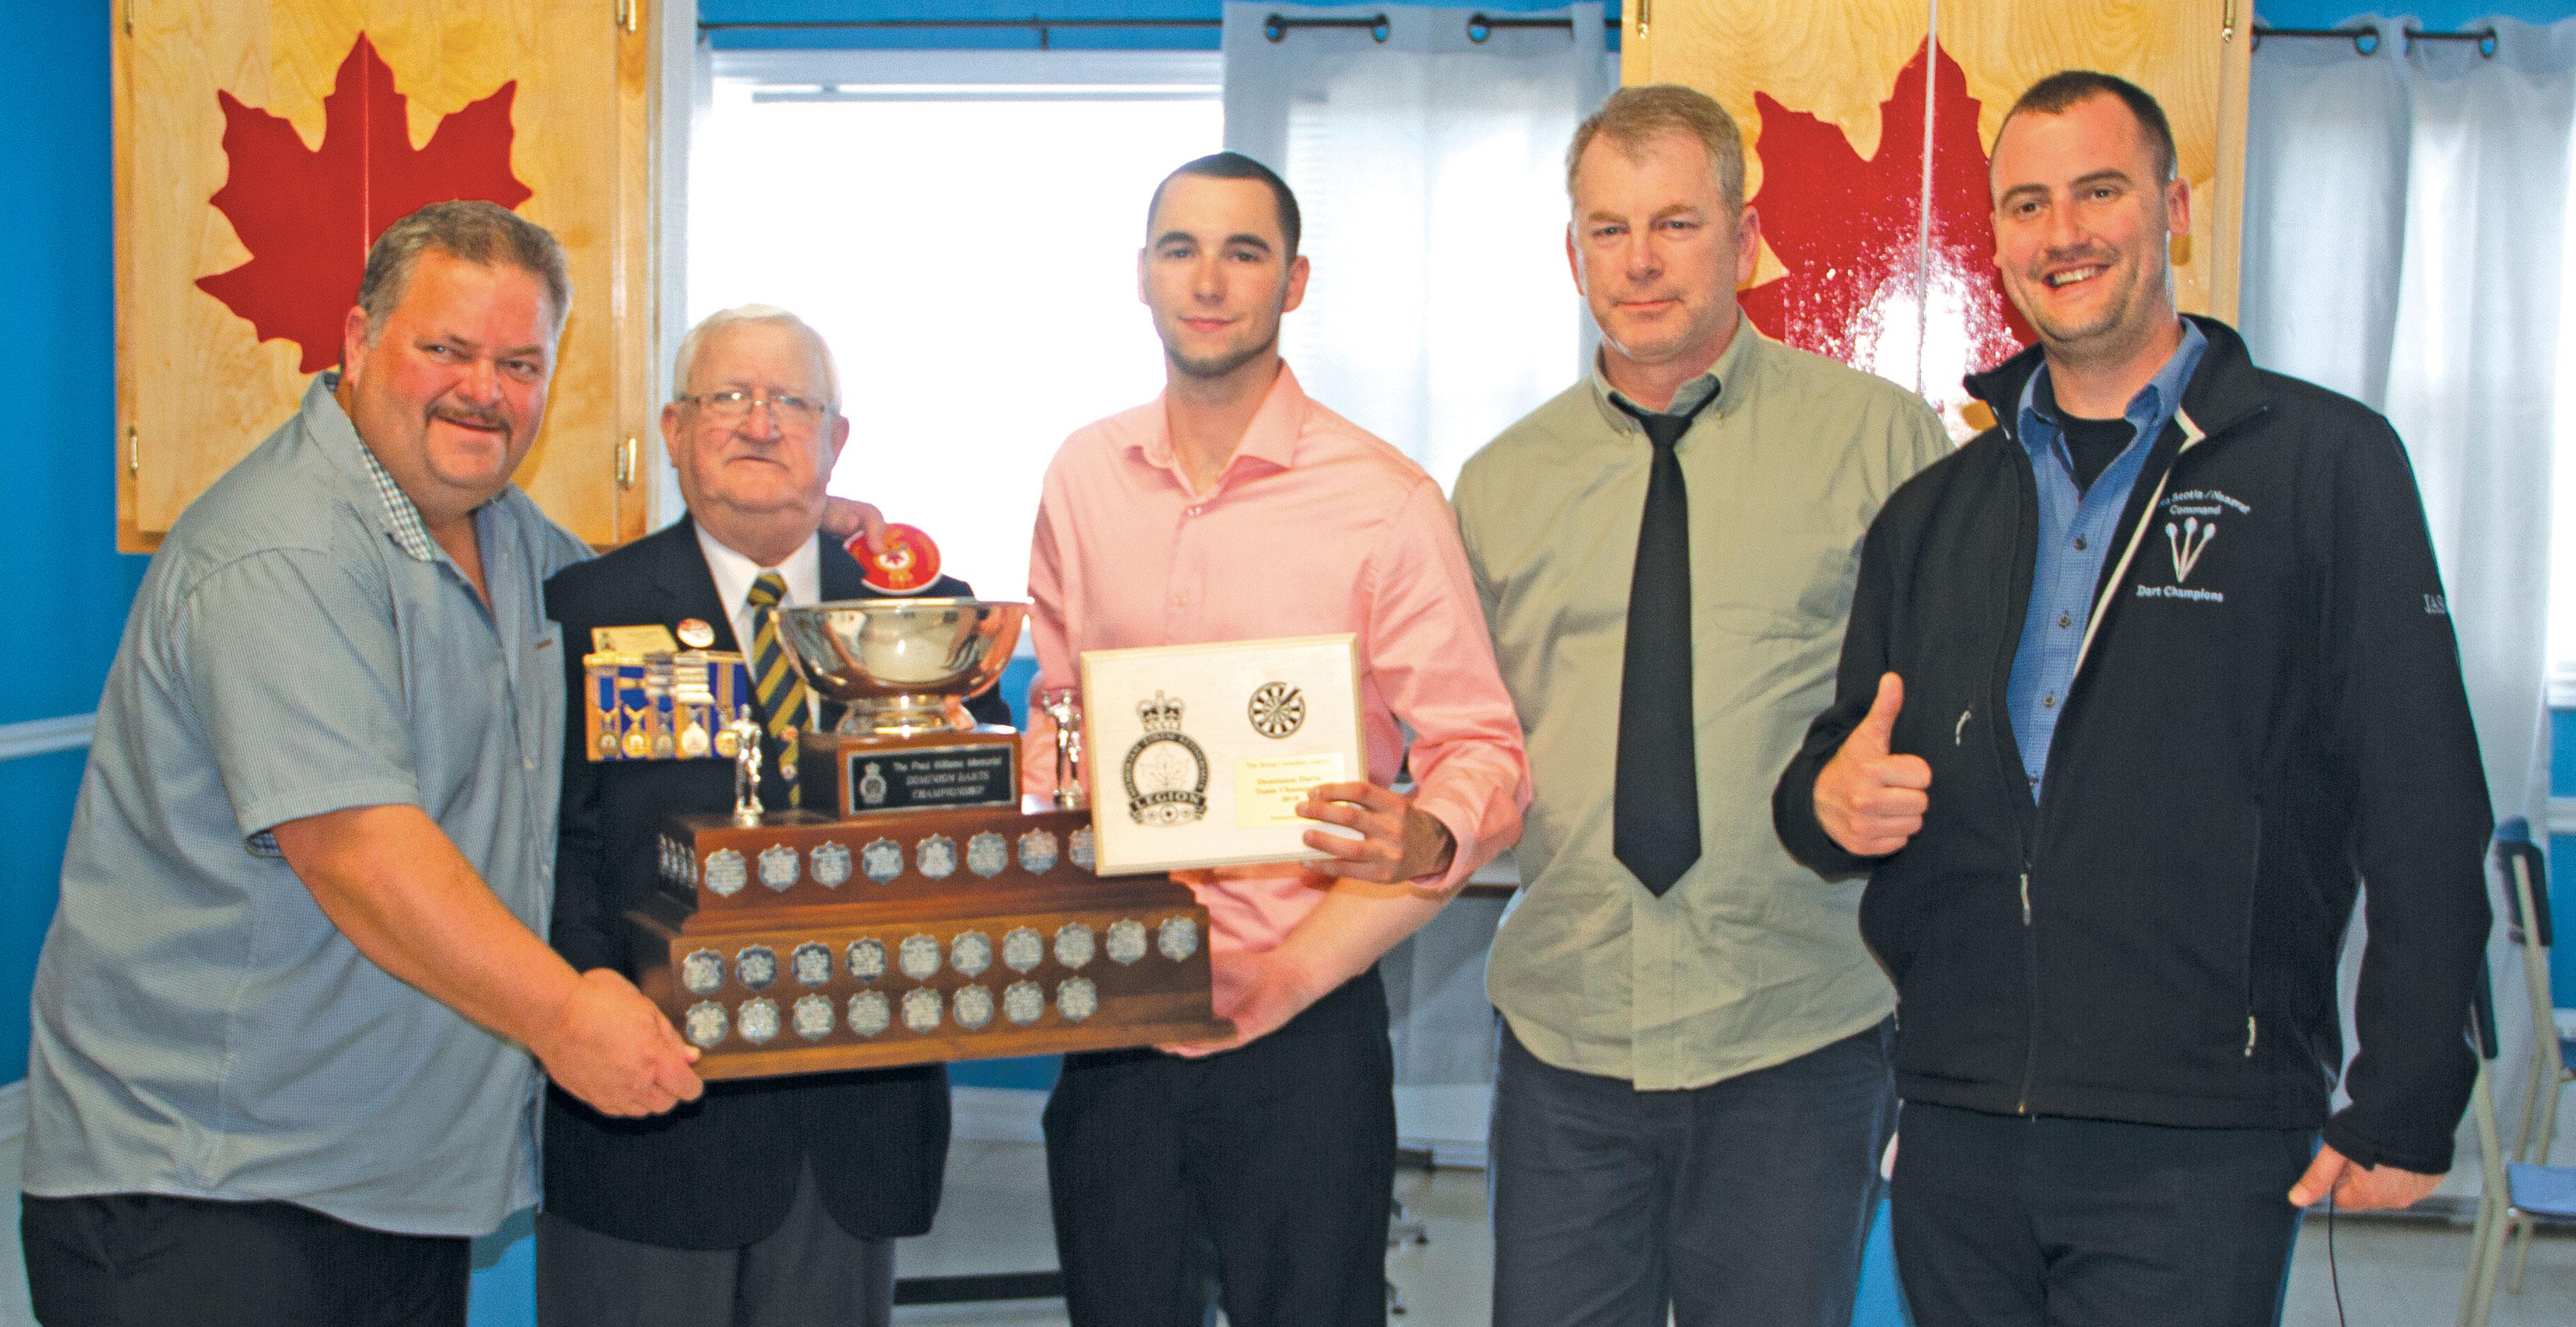 Darts trophy stays inNovaScotia